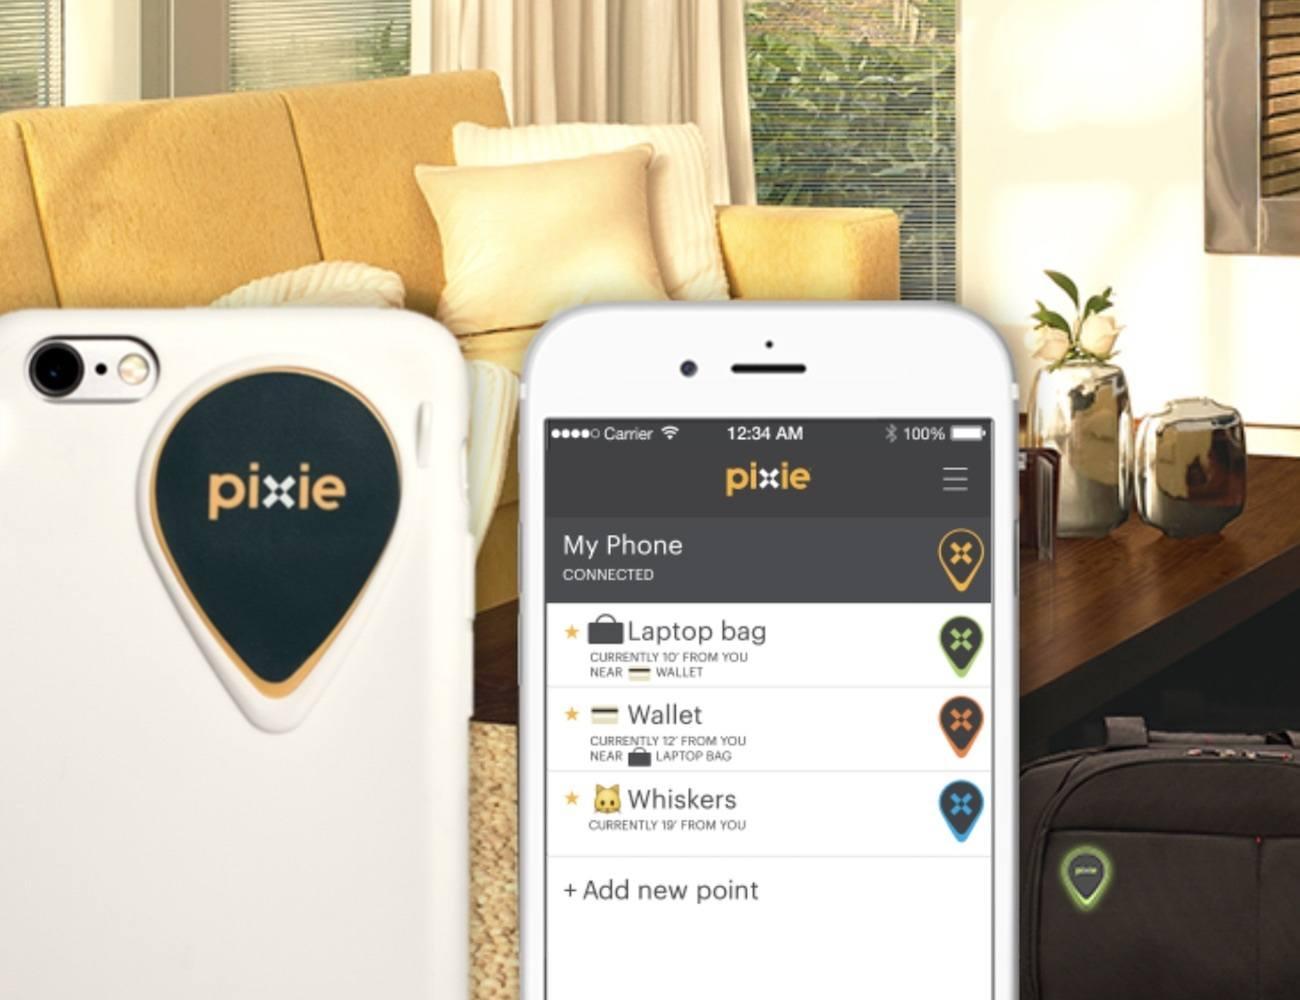 Pixie Bluetooth Tracker